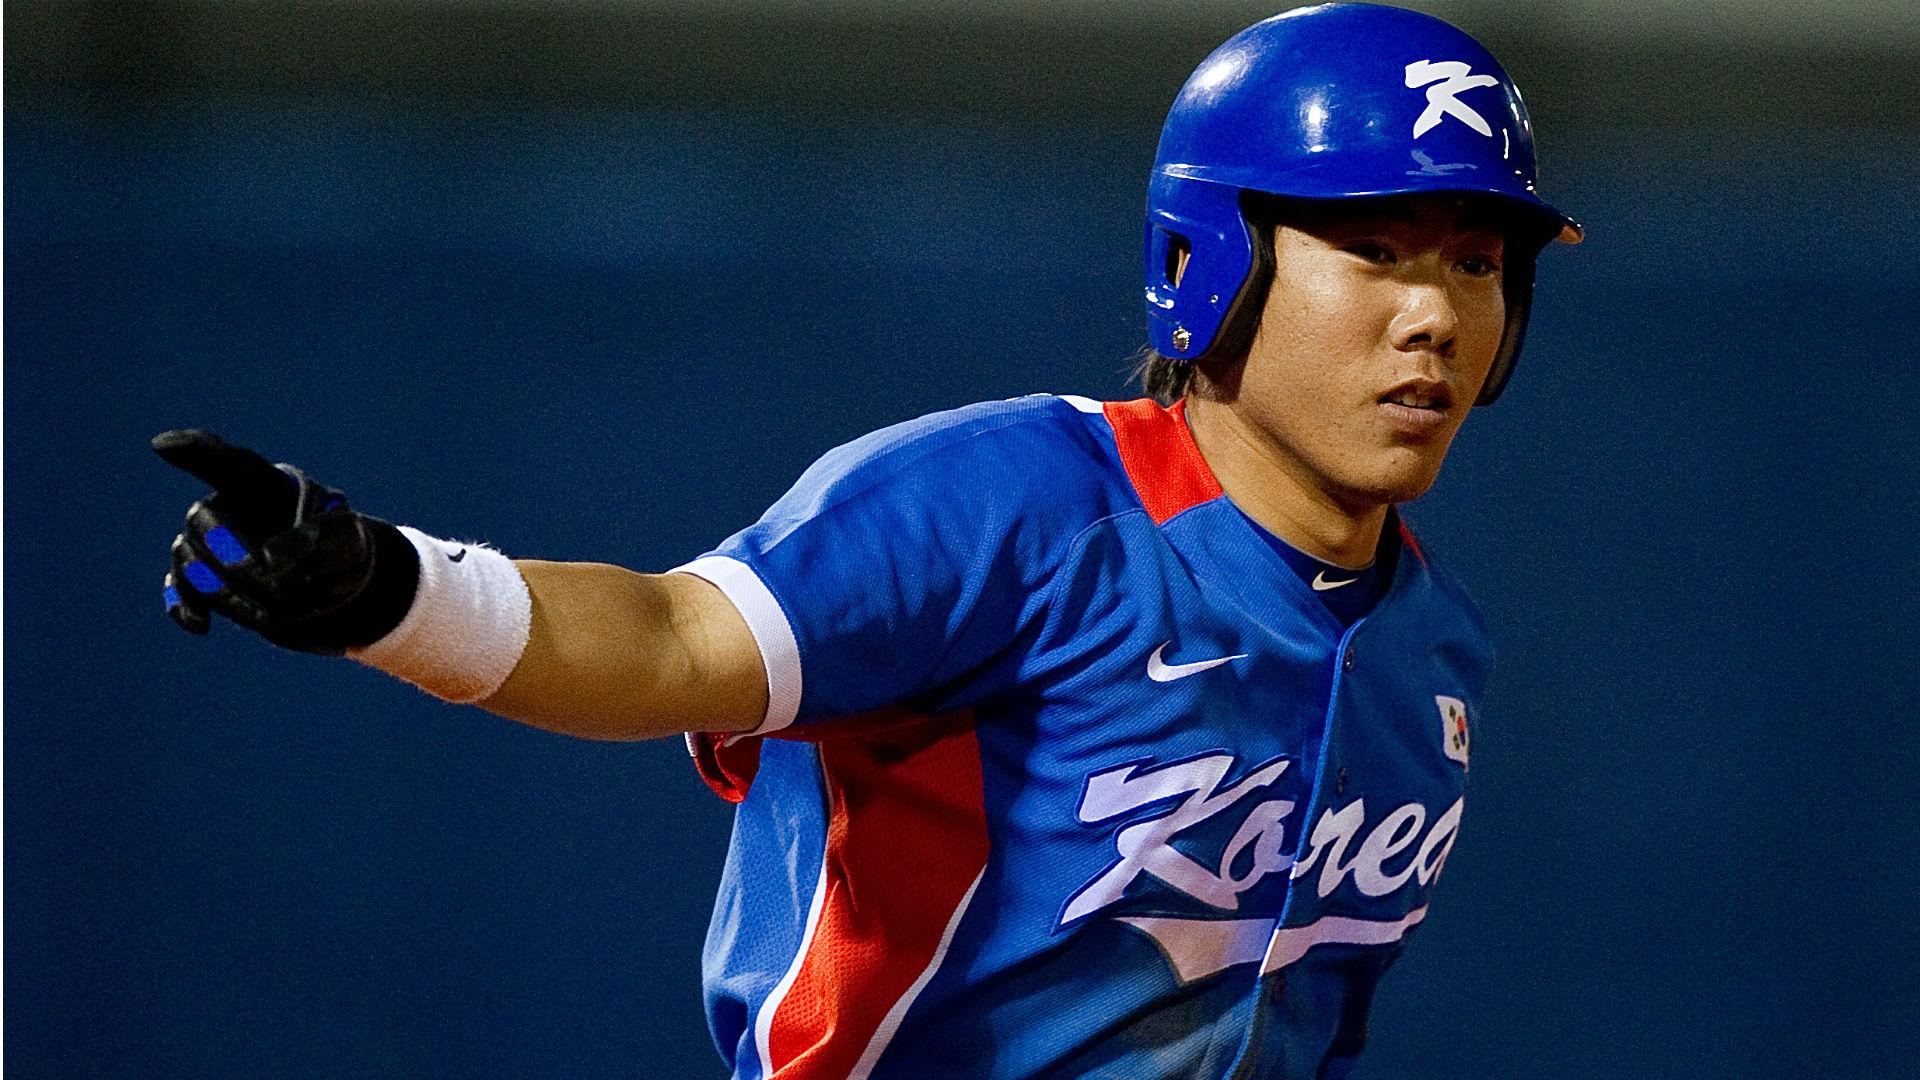 kang-jung-ho-011215-usnews-getty-ftr